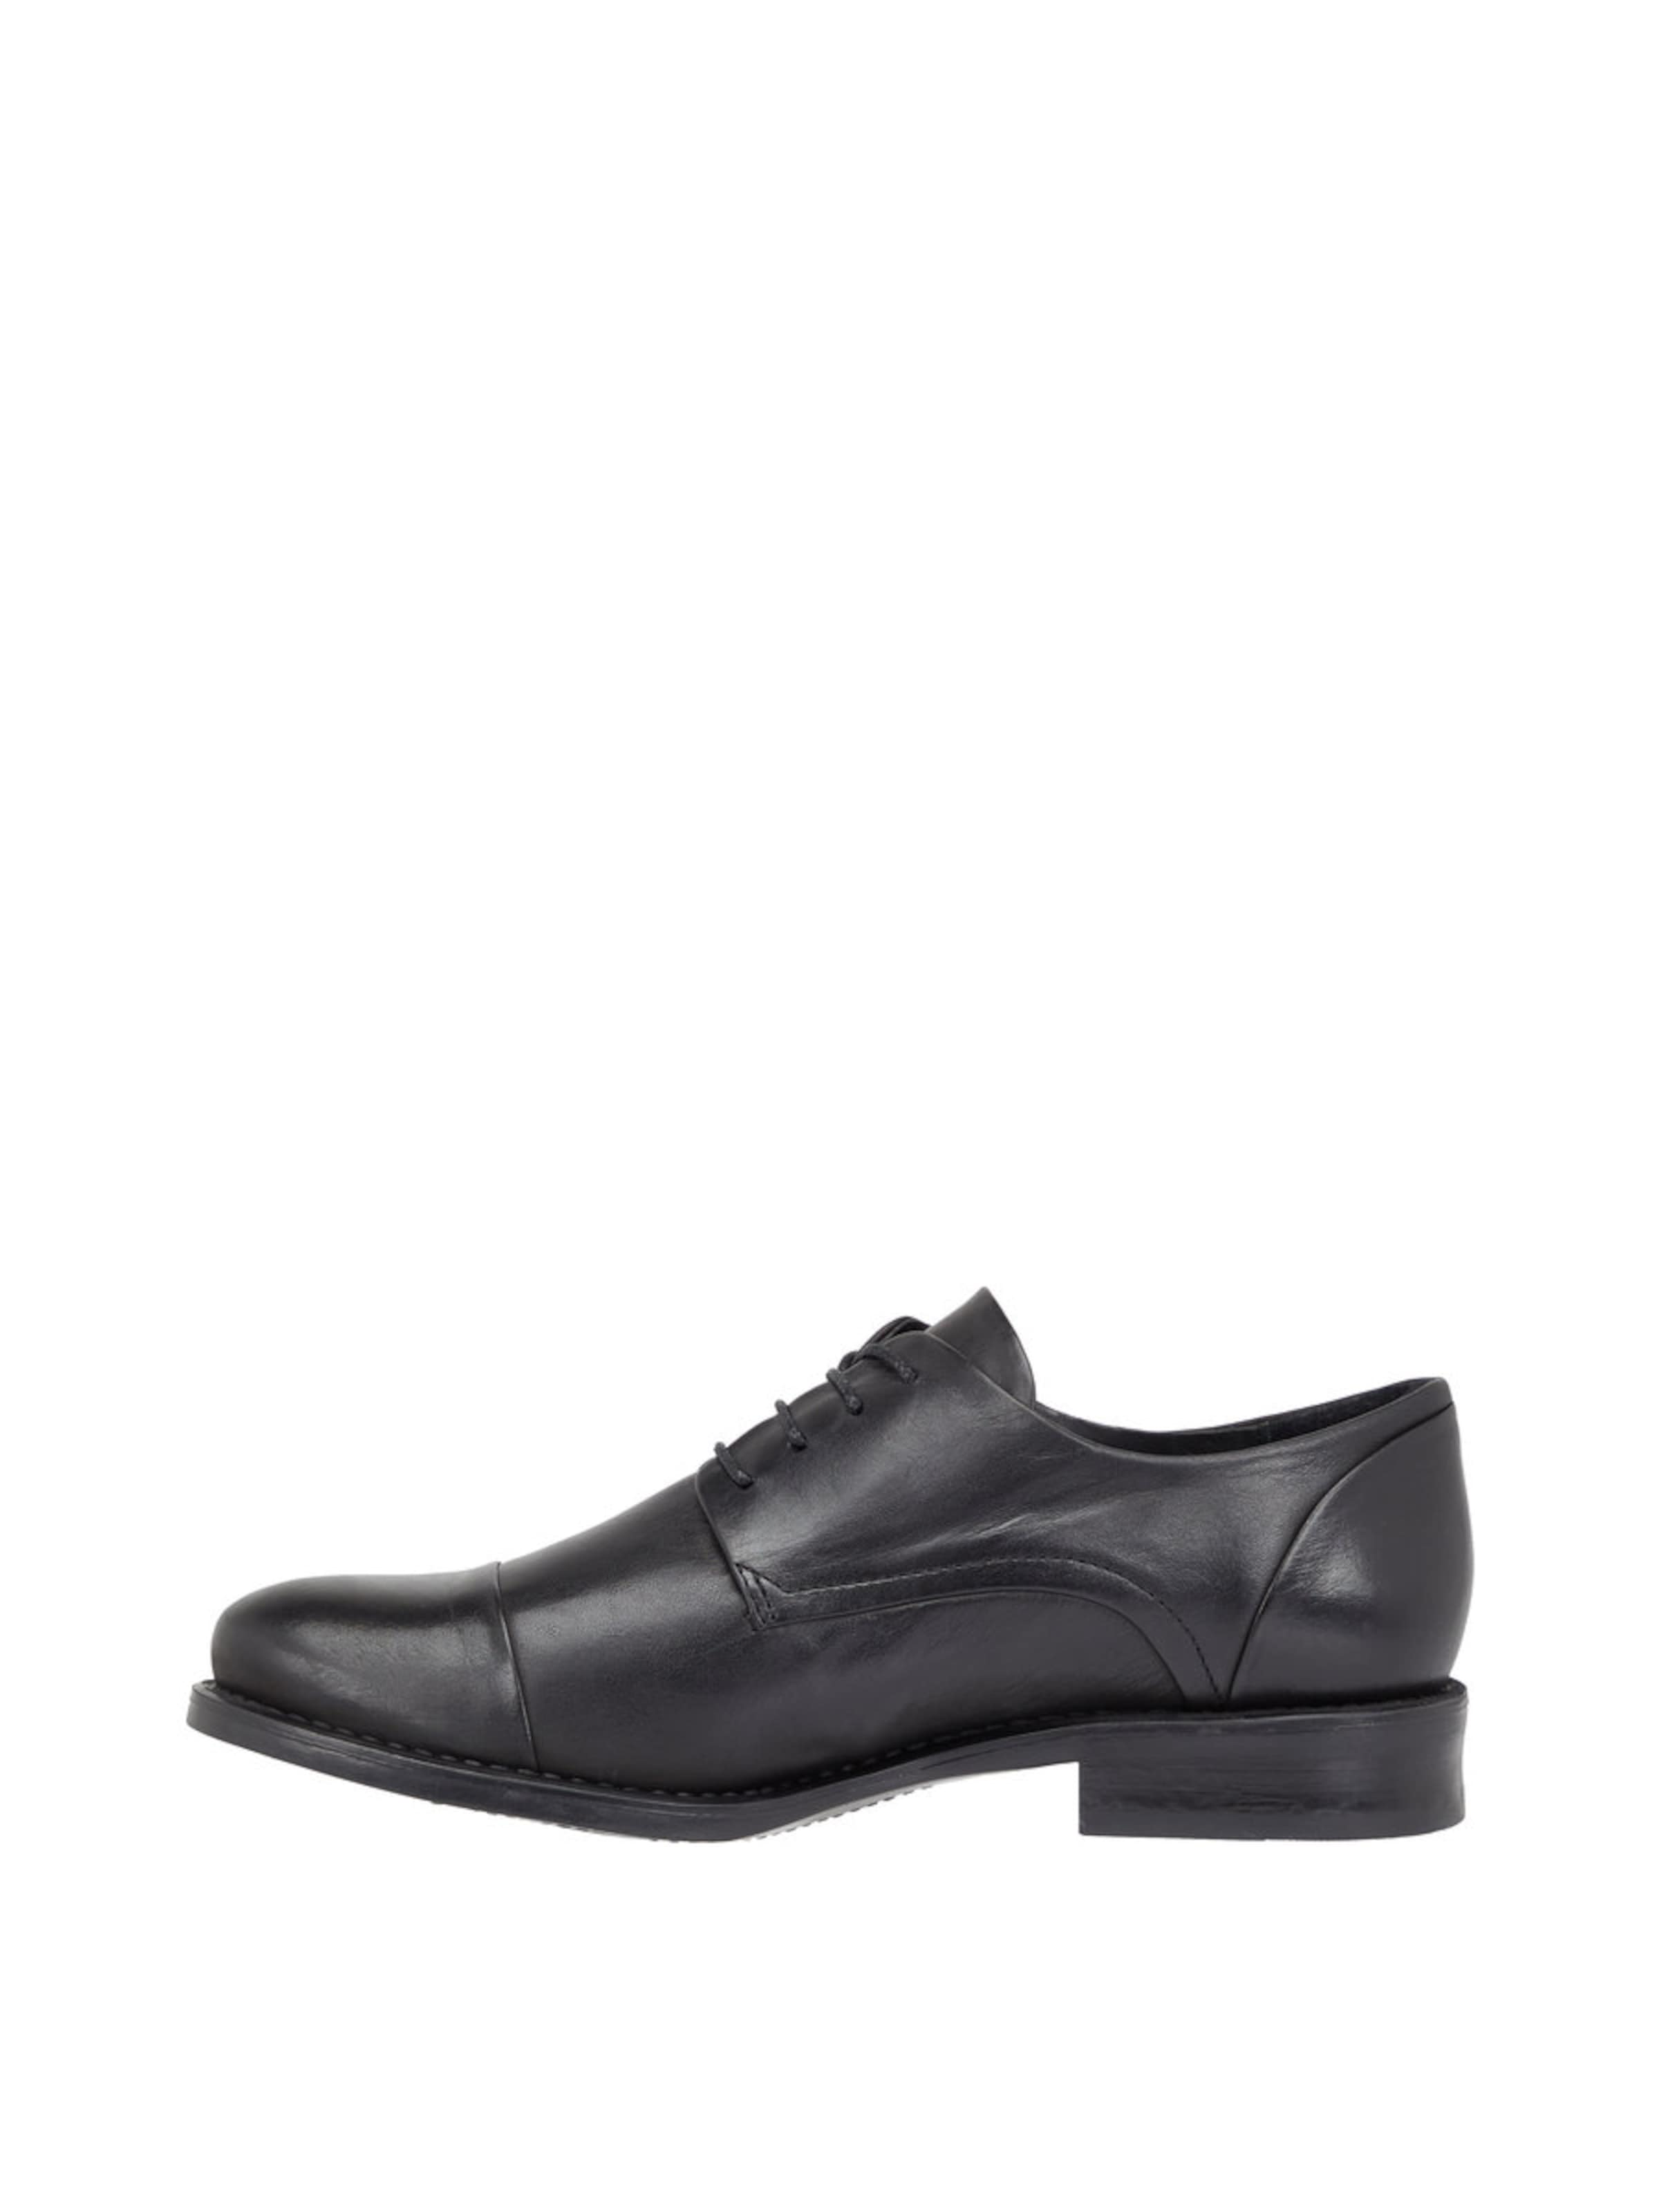 Haltbare Mode billige Schuhe Bianco Schuhe | Elegante Zehenkappen Schuhe Schuhe Bianco Gut getragene Schuhe a6b4dd